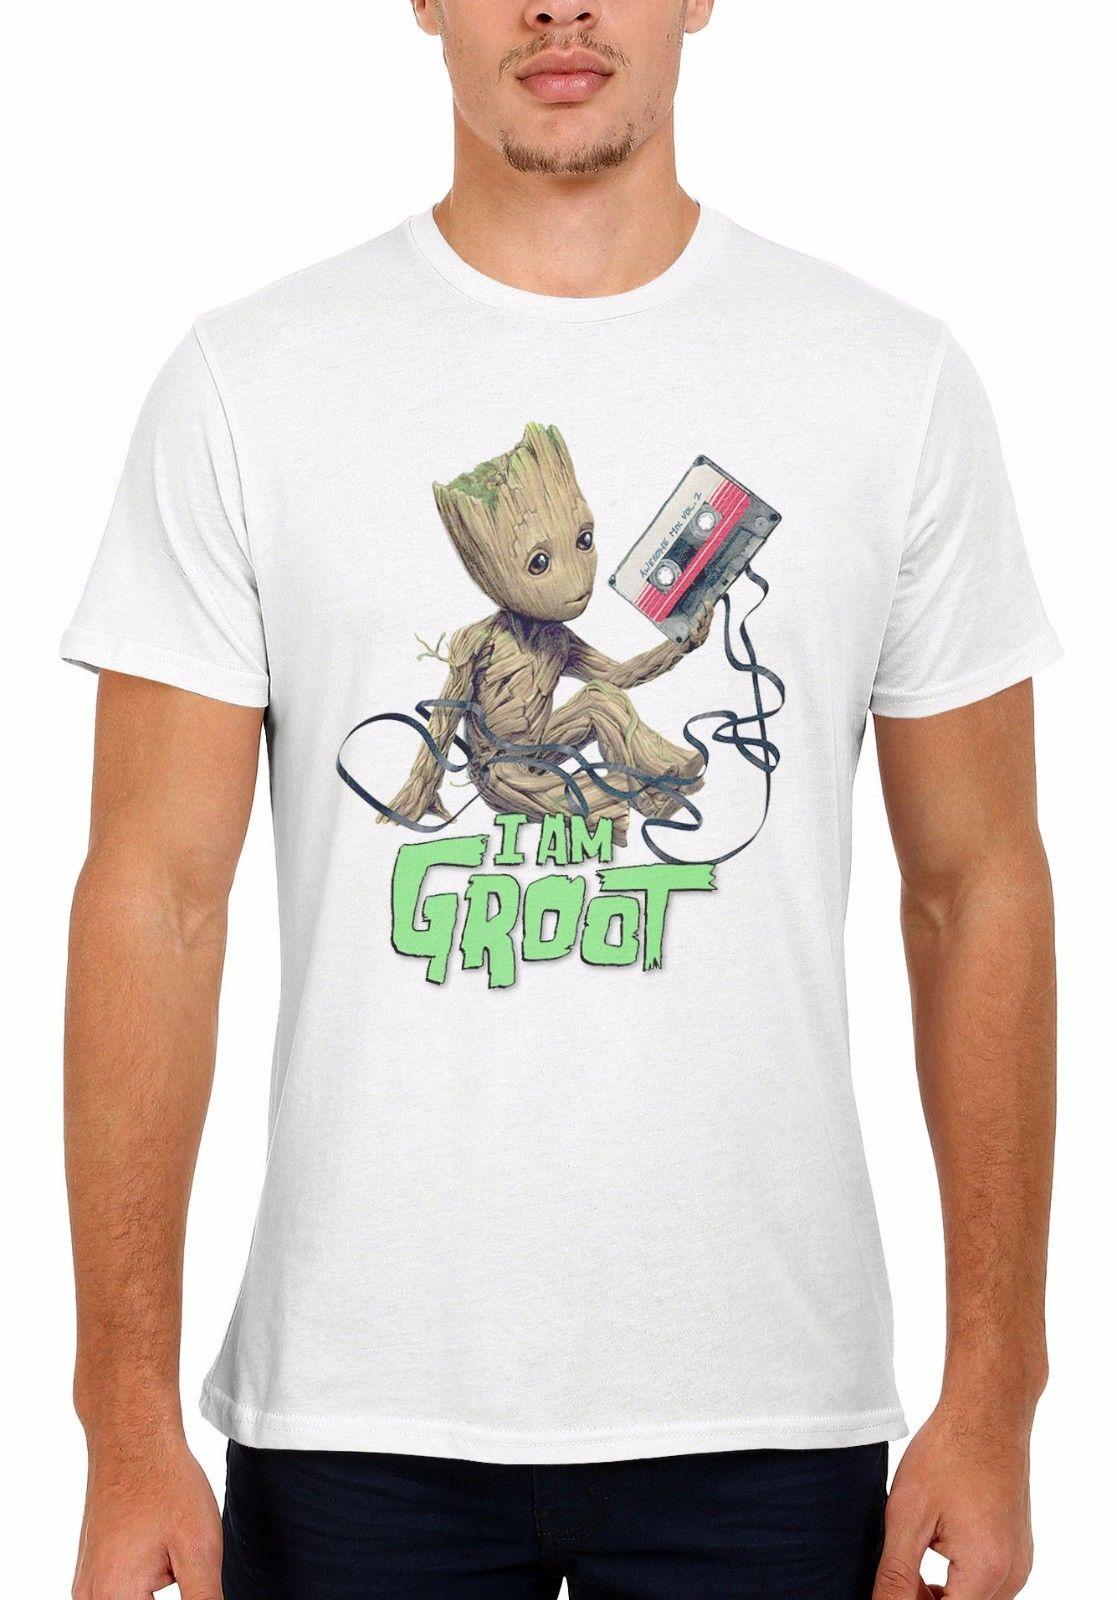 Großhandel Baby Groot Wächter Der Galaxie 2 Männer Frauen Weste Tank Top  Unisex T Shirt 1943 Print Tee Männer Kurzarm Kleidung Top Tee Von Baishi4,  ... aecd802d1b